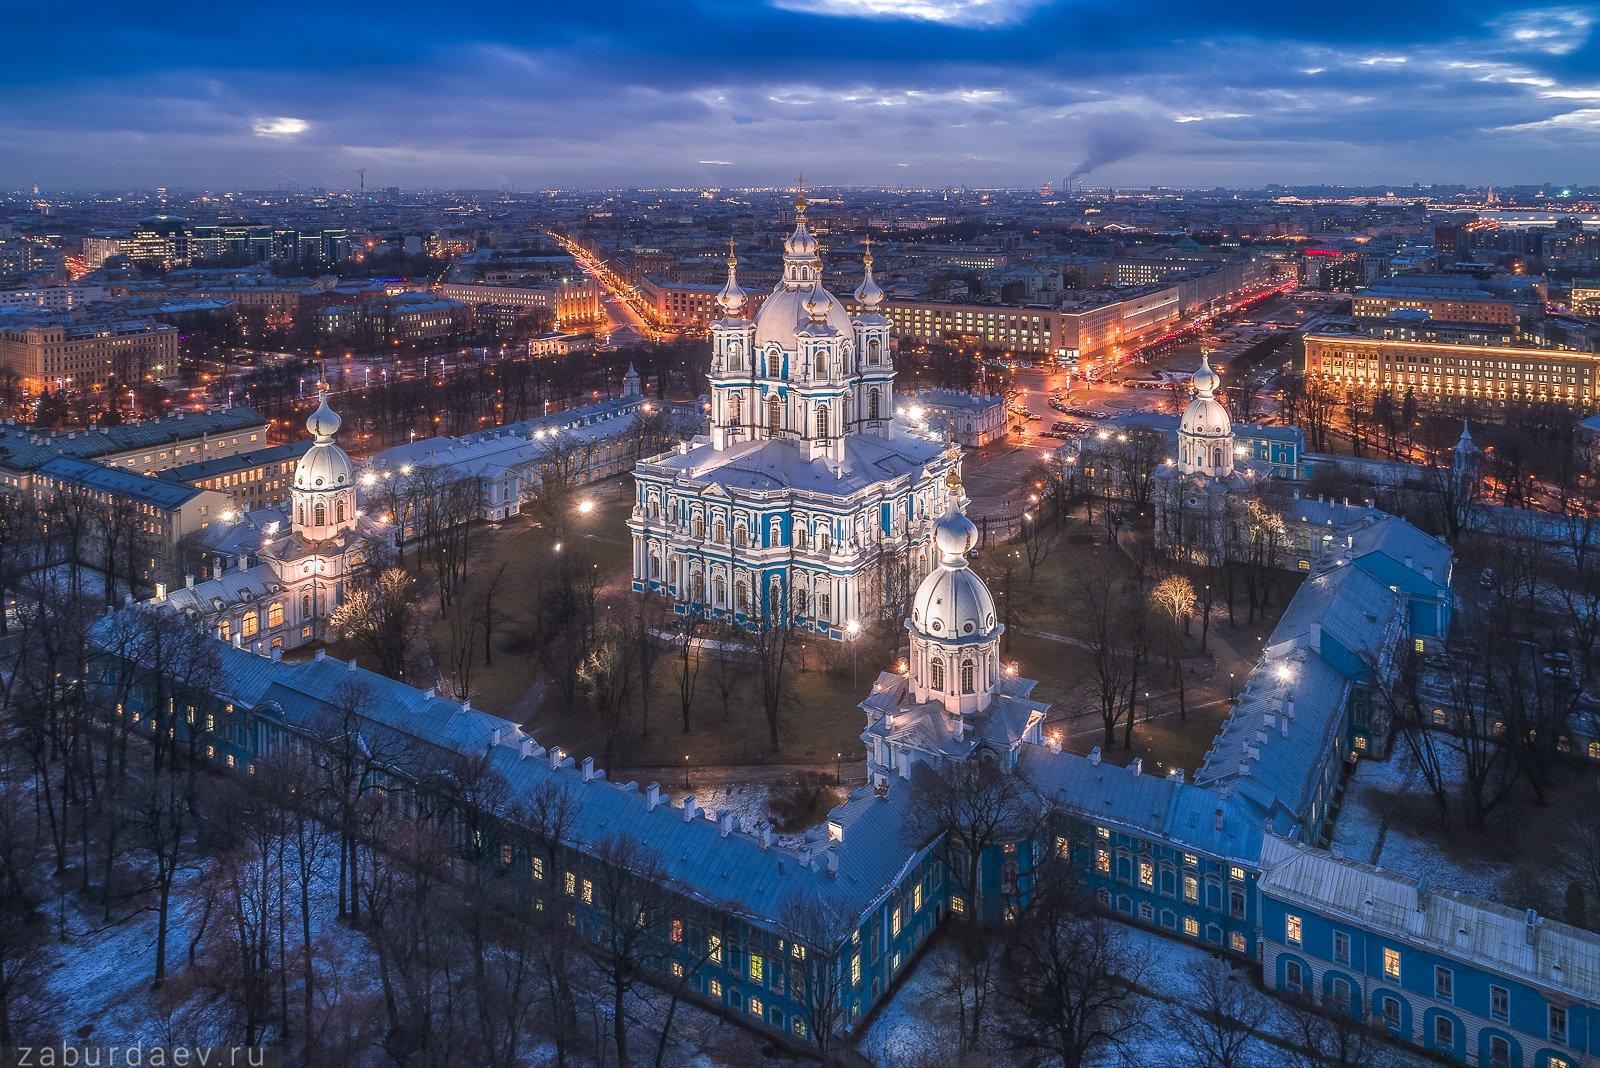 россия, петербург, вечер, зима, собор, аэрофотосъемка, дрон, снег, Станислав Забурдаев